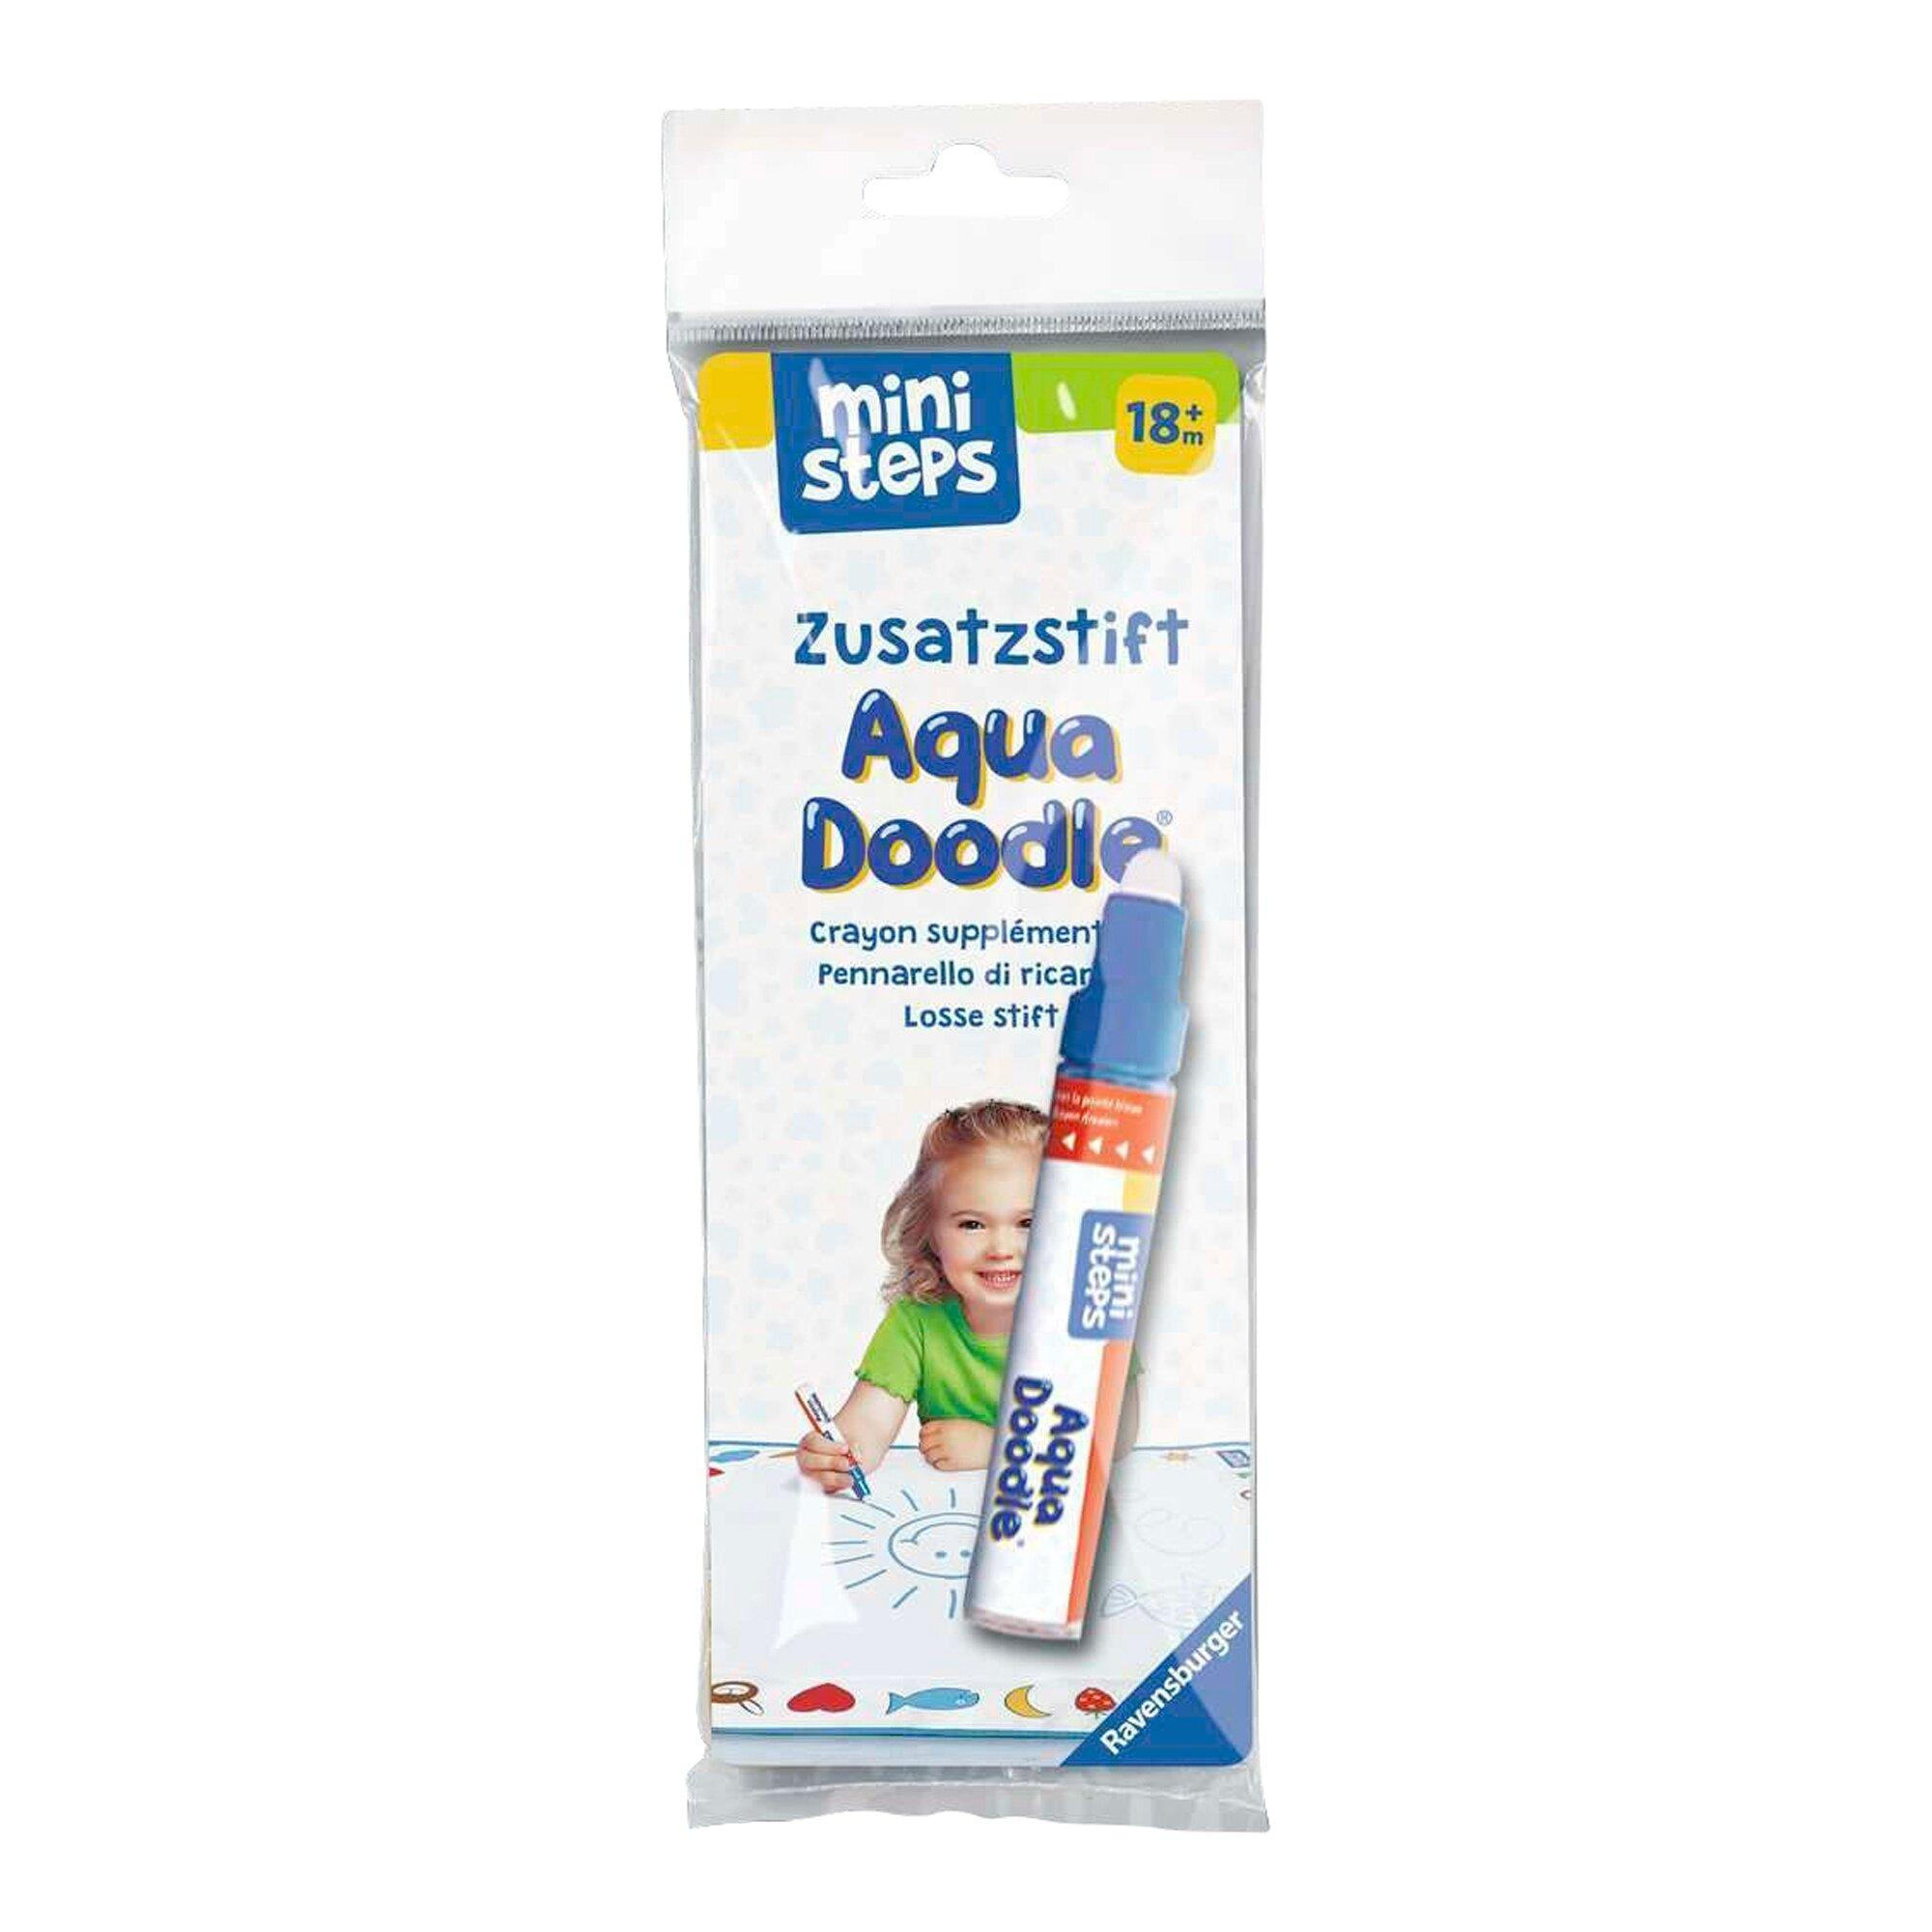 Aqua Doodle® Zusatzstift